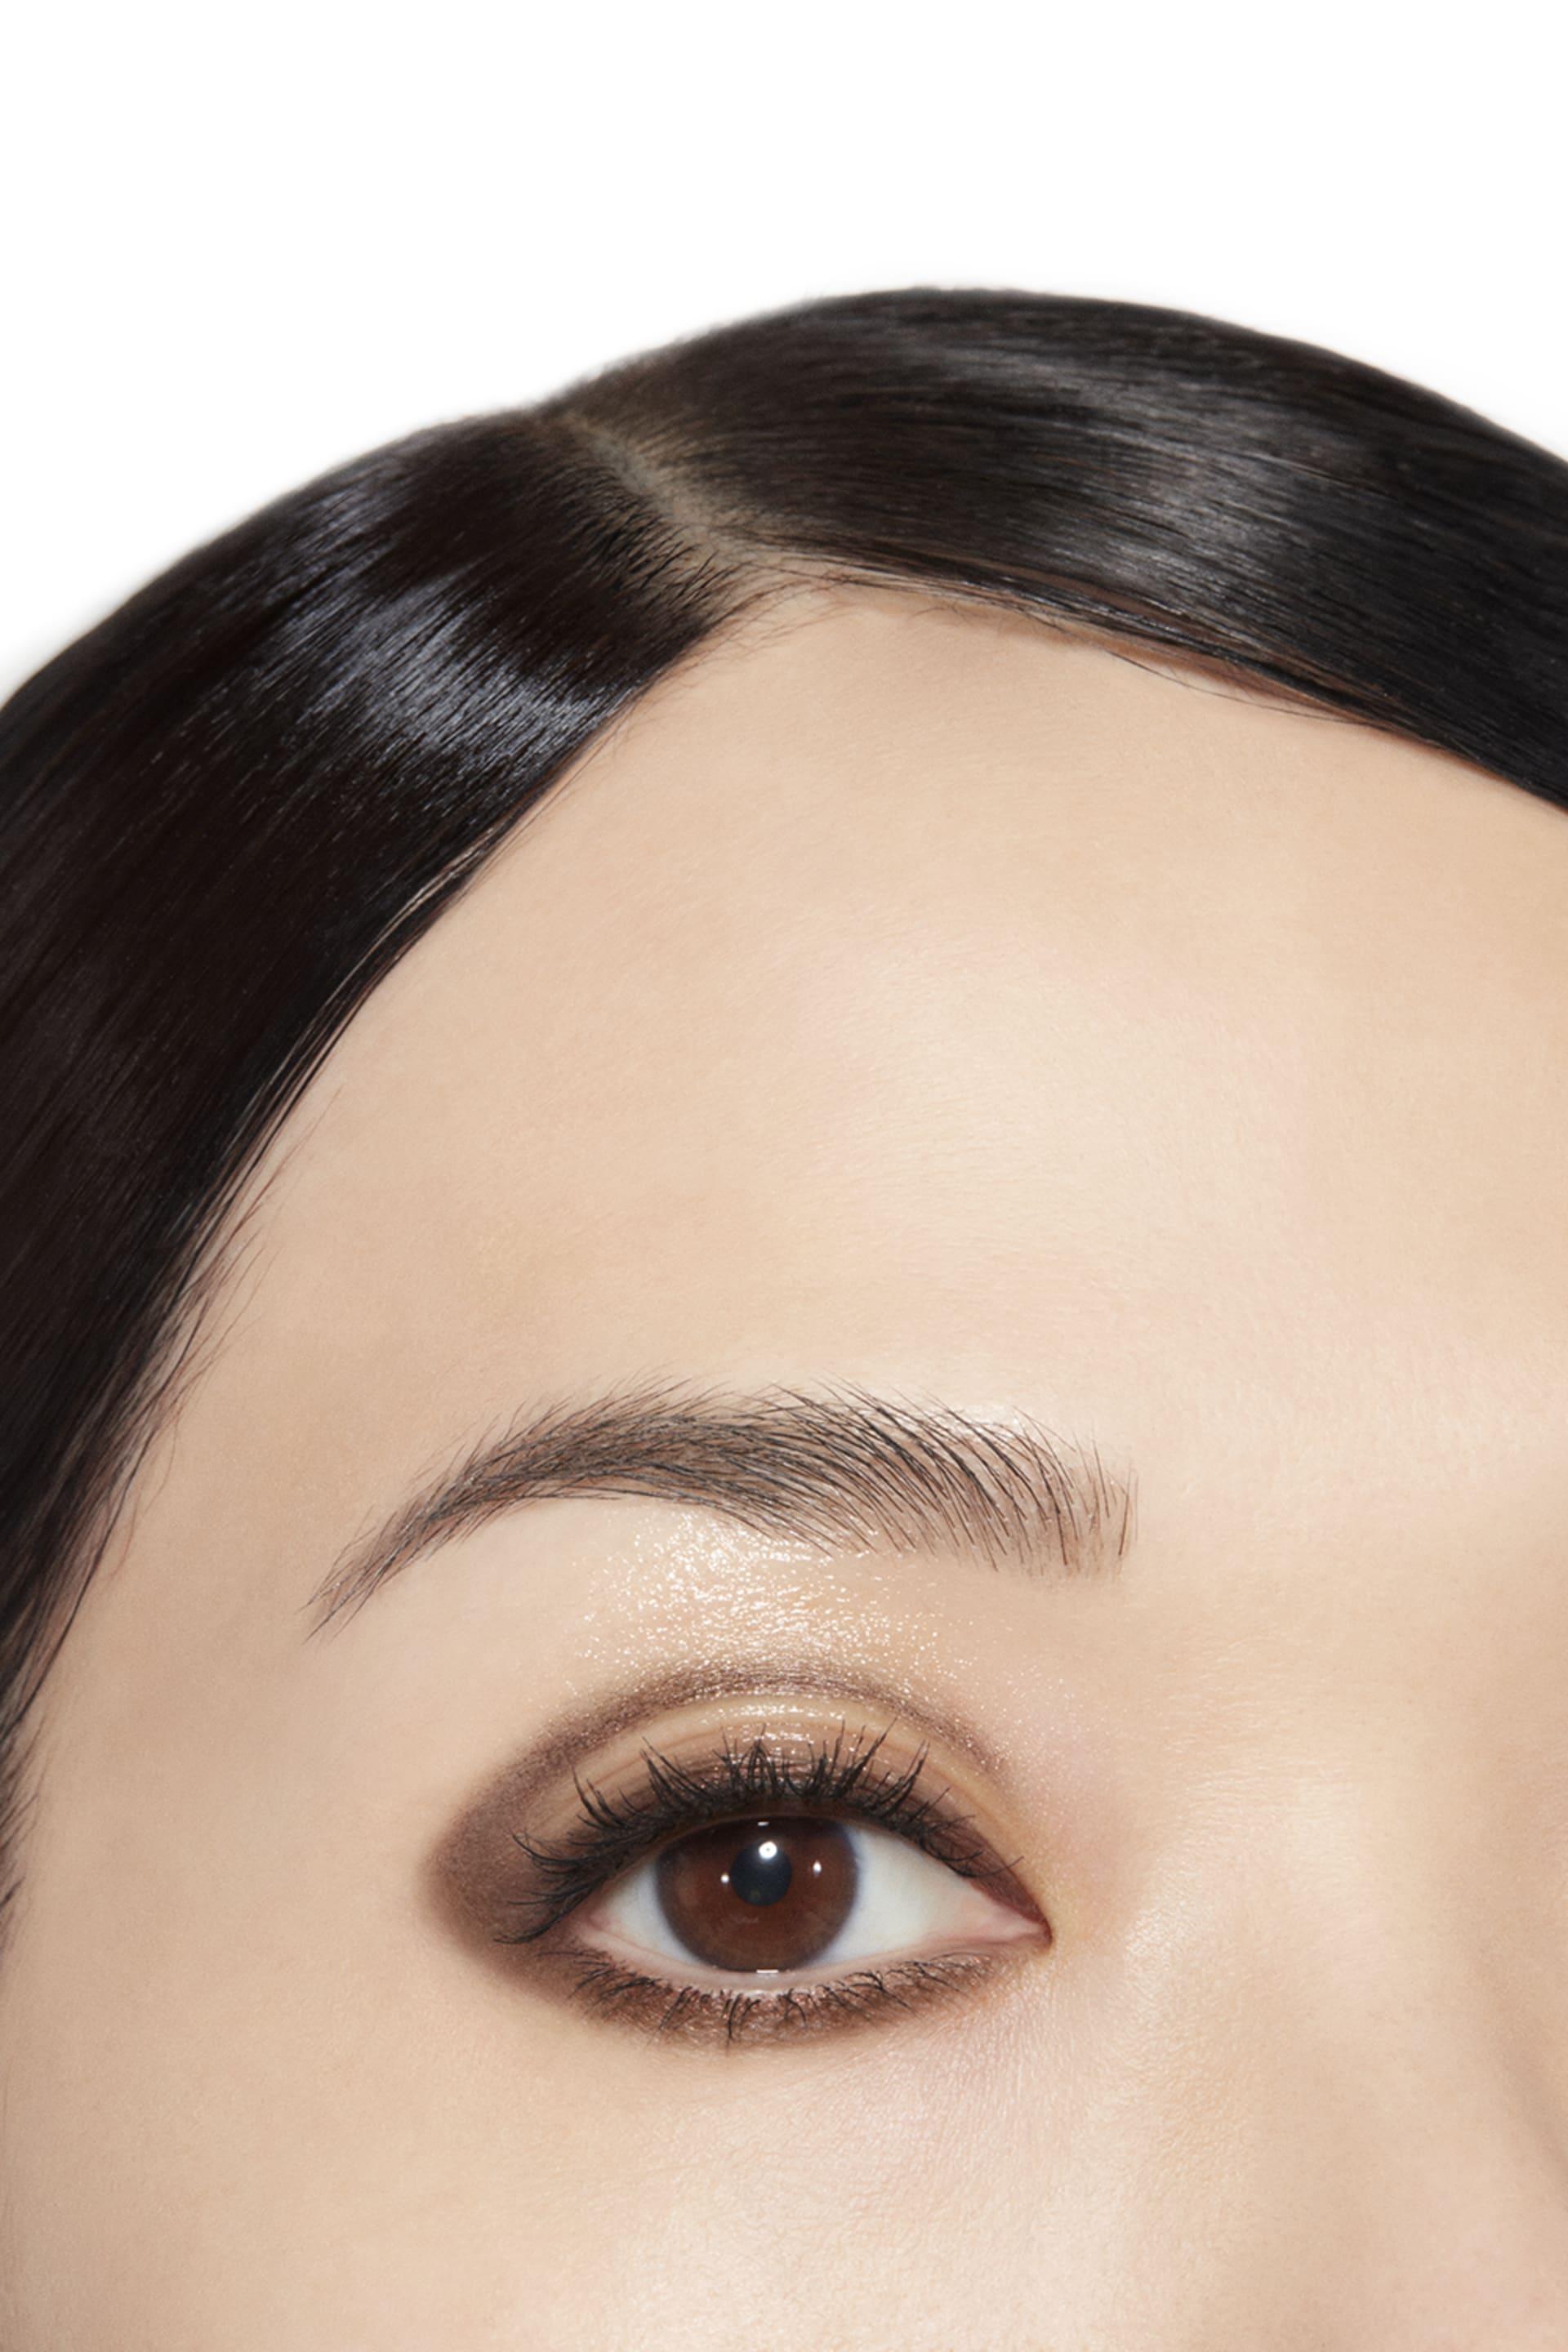 Application makeup visual 1 - Stylo Ombre et Contour 04 - ELECTRIC BROWN